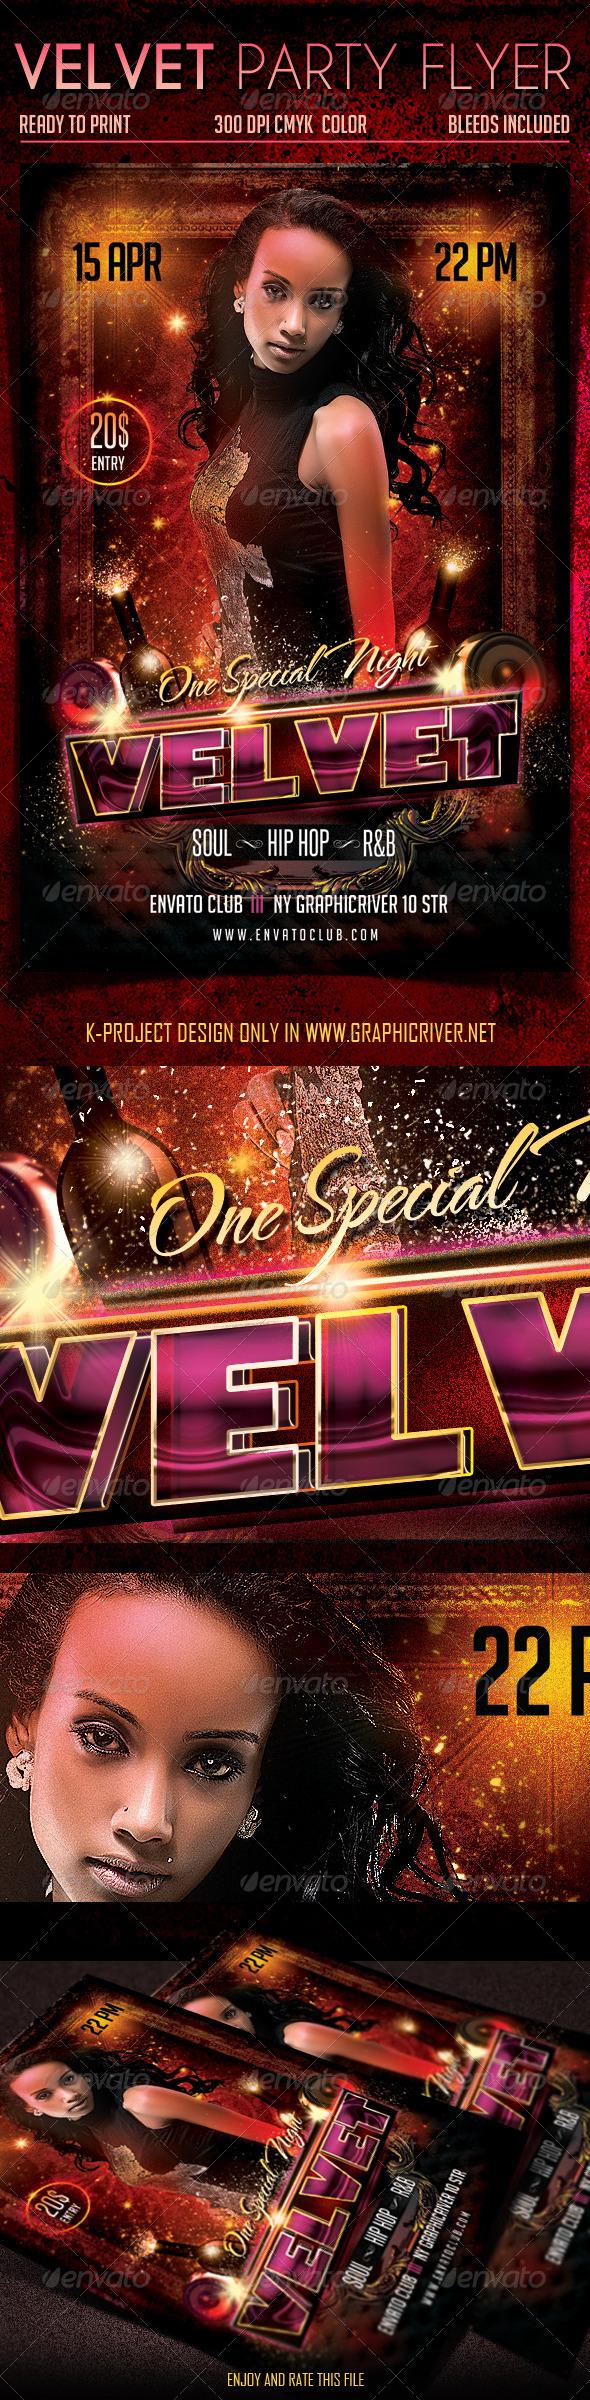 GraphicRiver Velvet Party Flyer 6960087